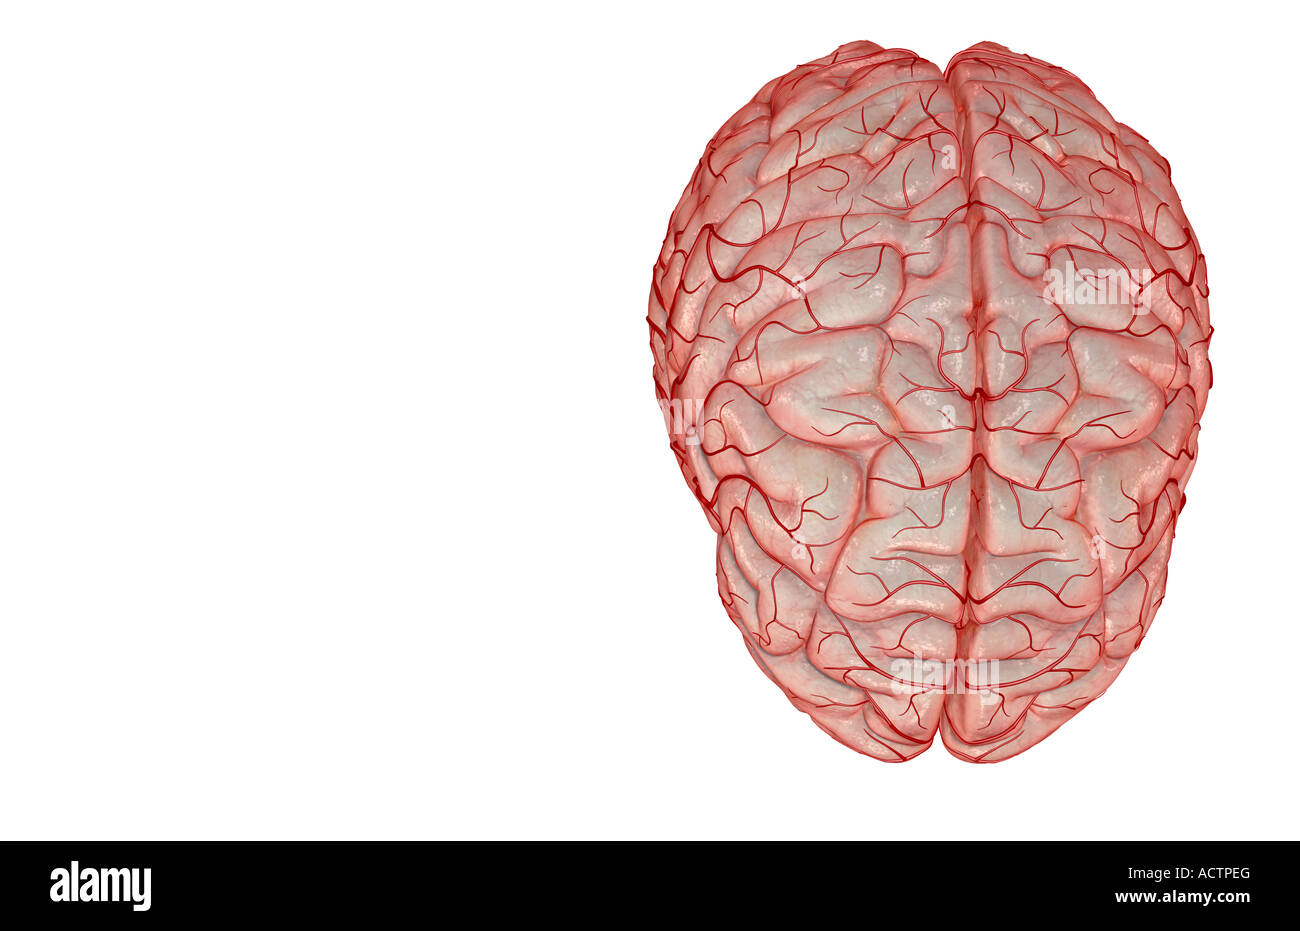 Middle Cerebral Artery Stockfotos & Middle Cerebral Artery Bilder ...